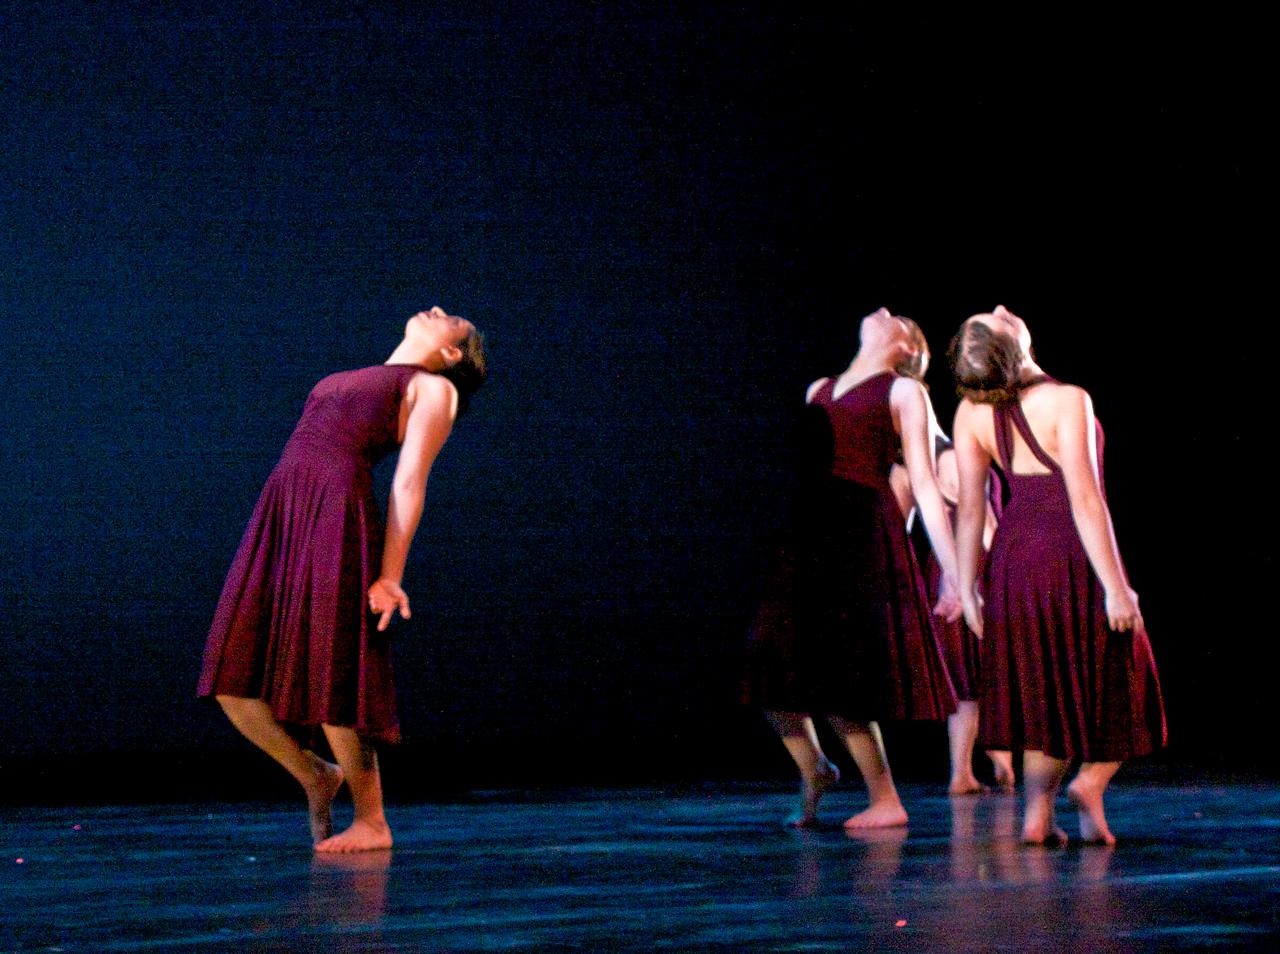 Dance wkshp -troupe 320100121_0090_1